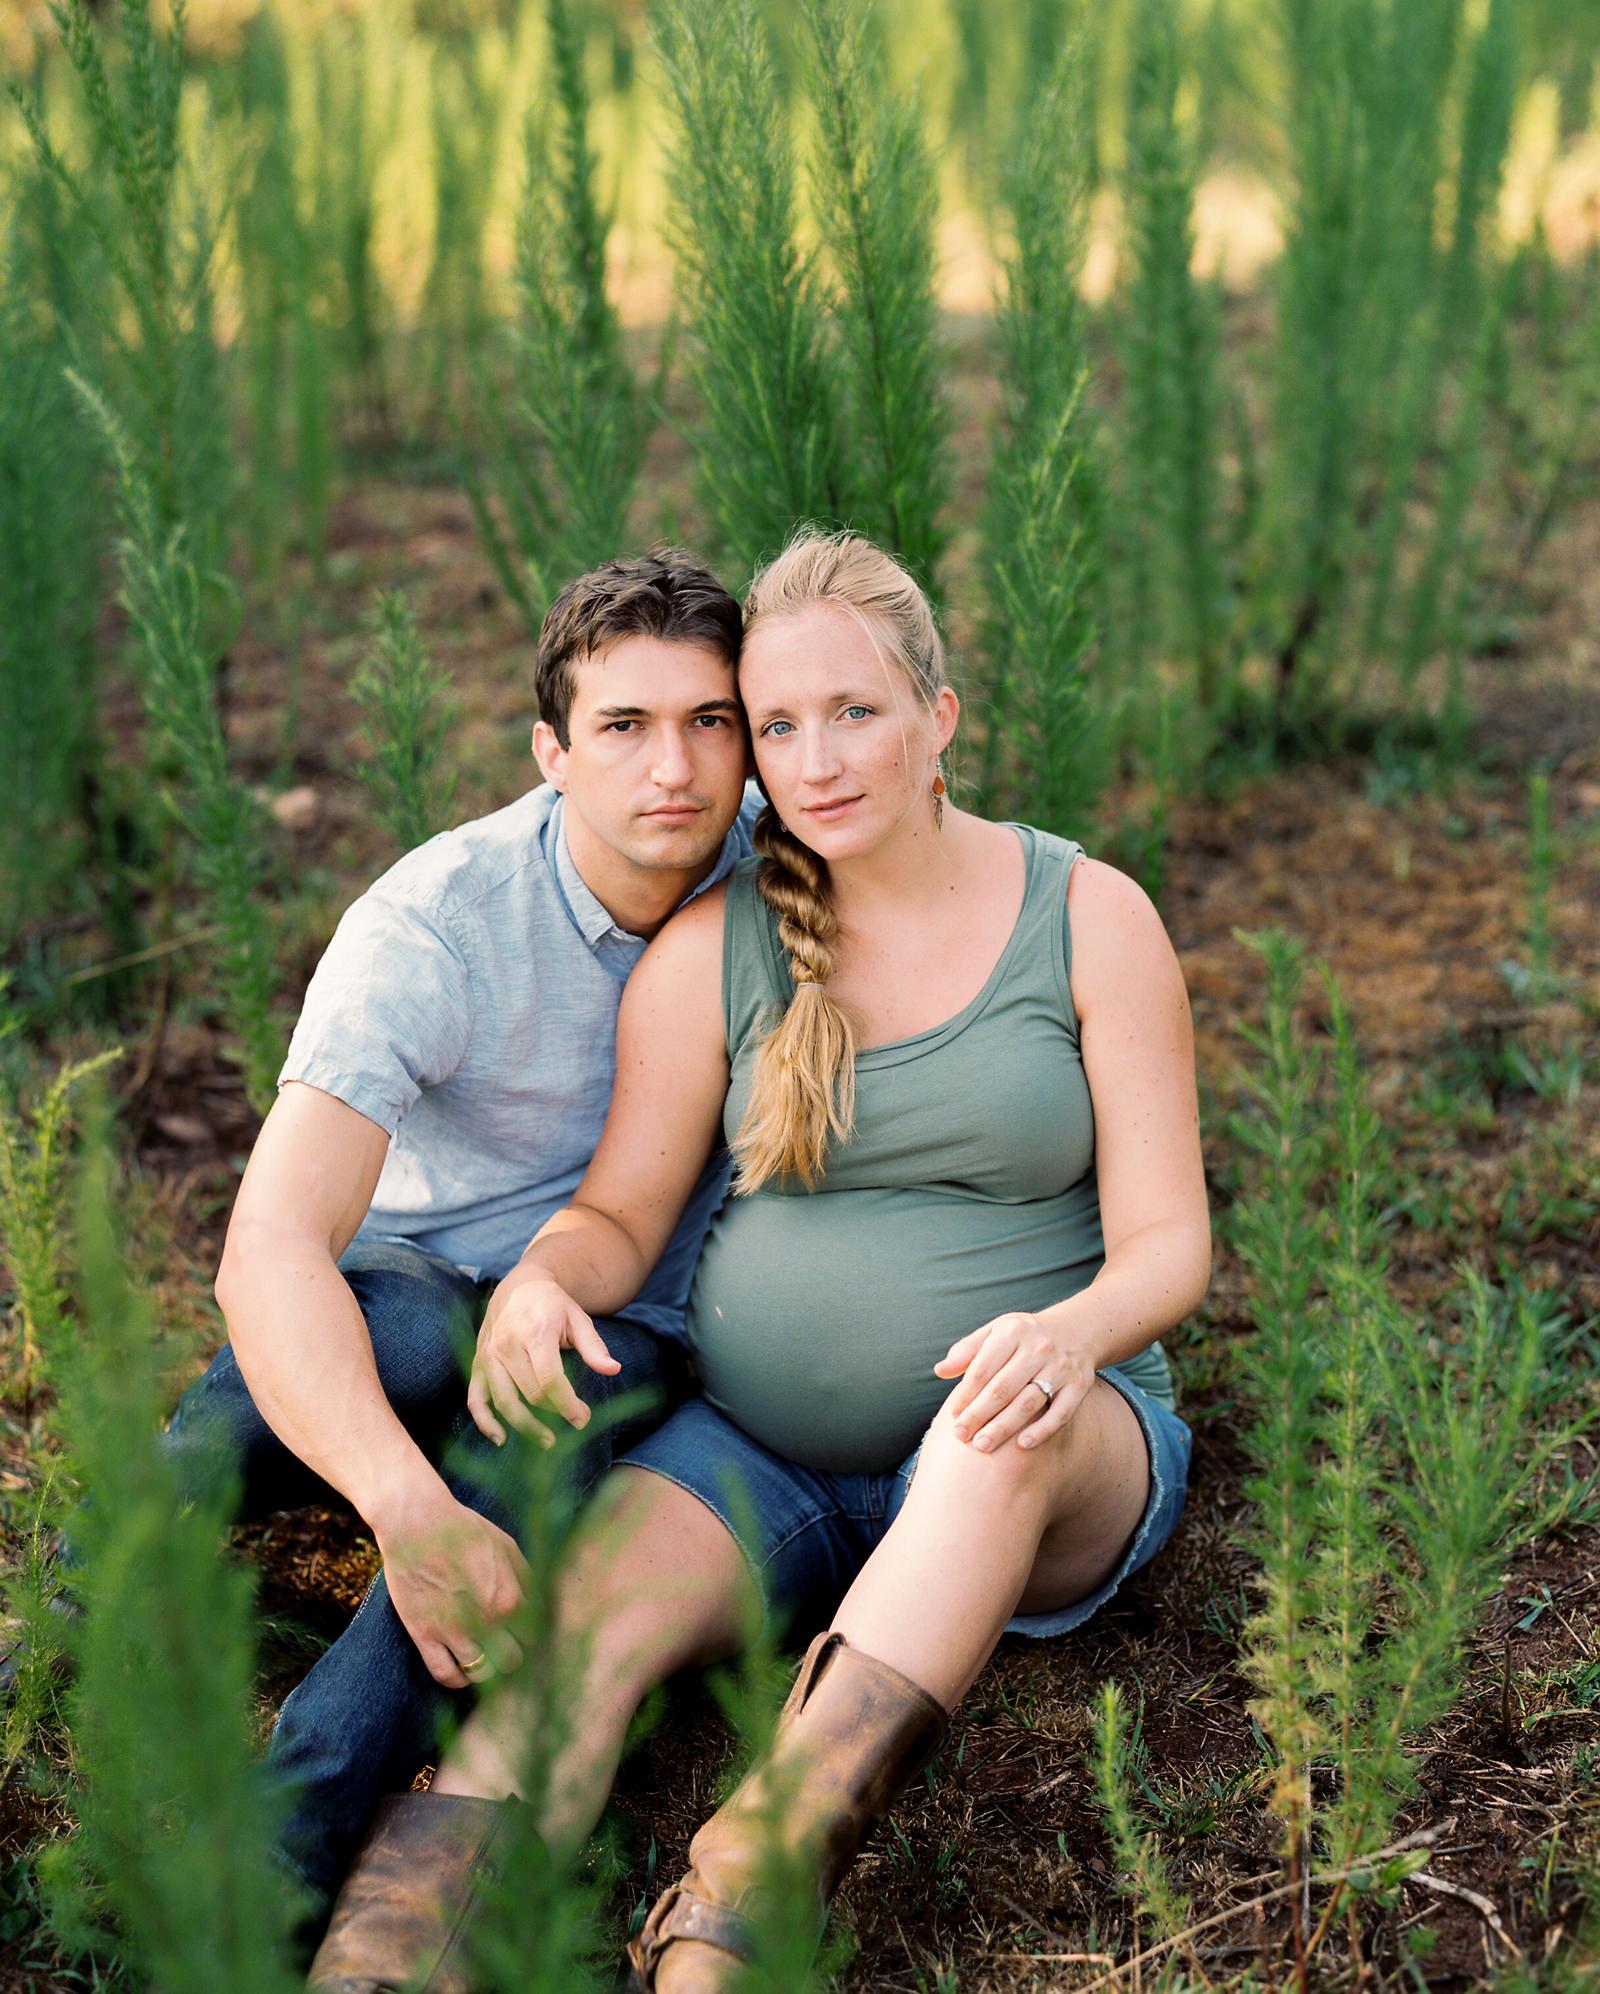 014-maternity-fine-art-film-lifestyle-photography.jpg